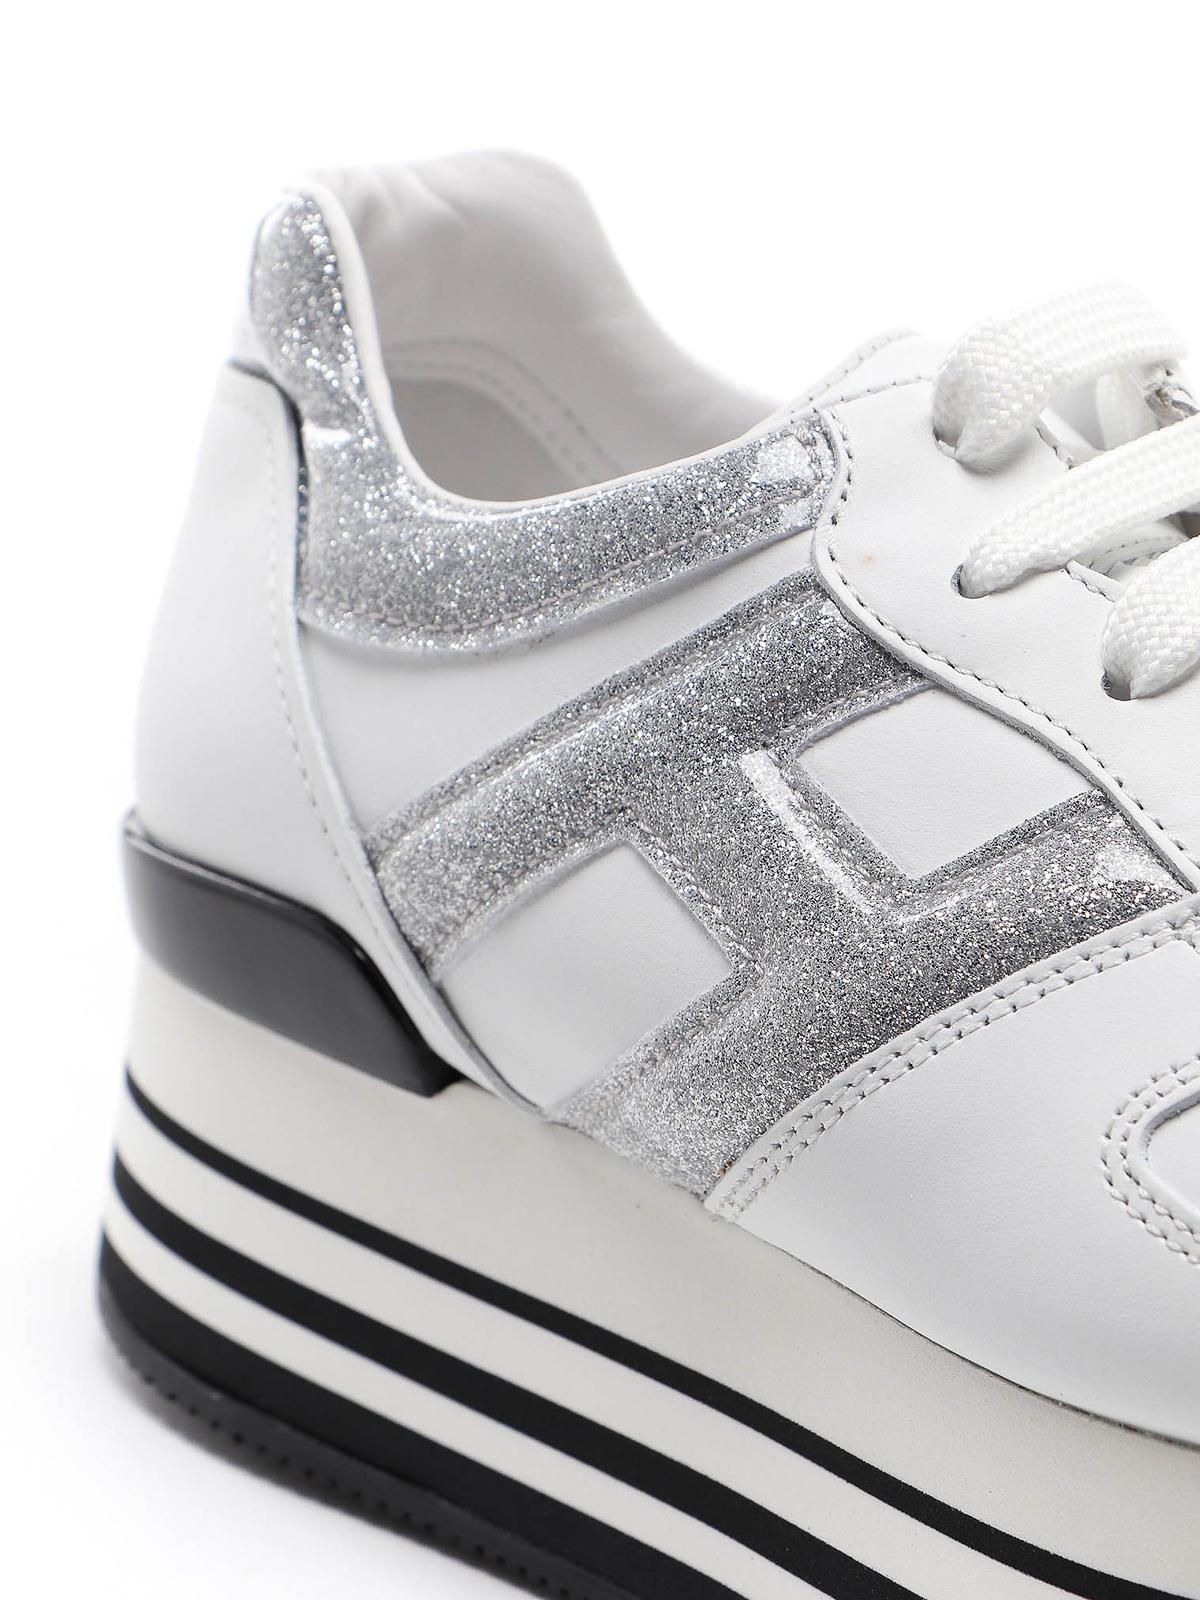 Hogan - Maxi H222 sneakers - trainers - HXW2830T548N1Q0351 | iKRIX.com